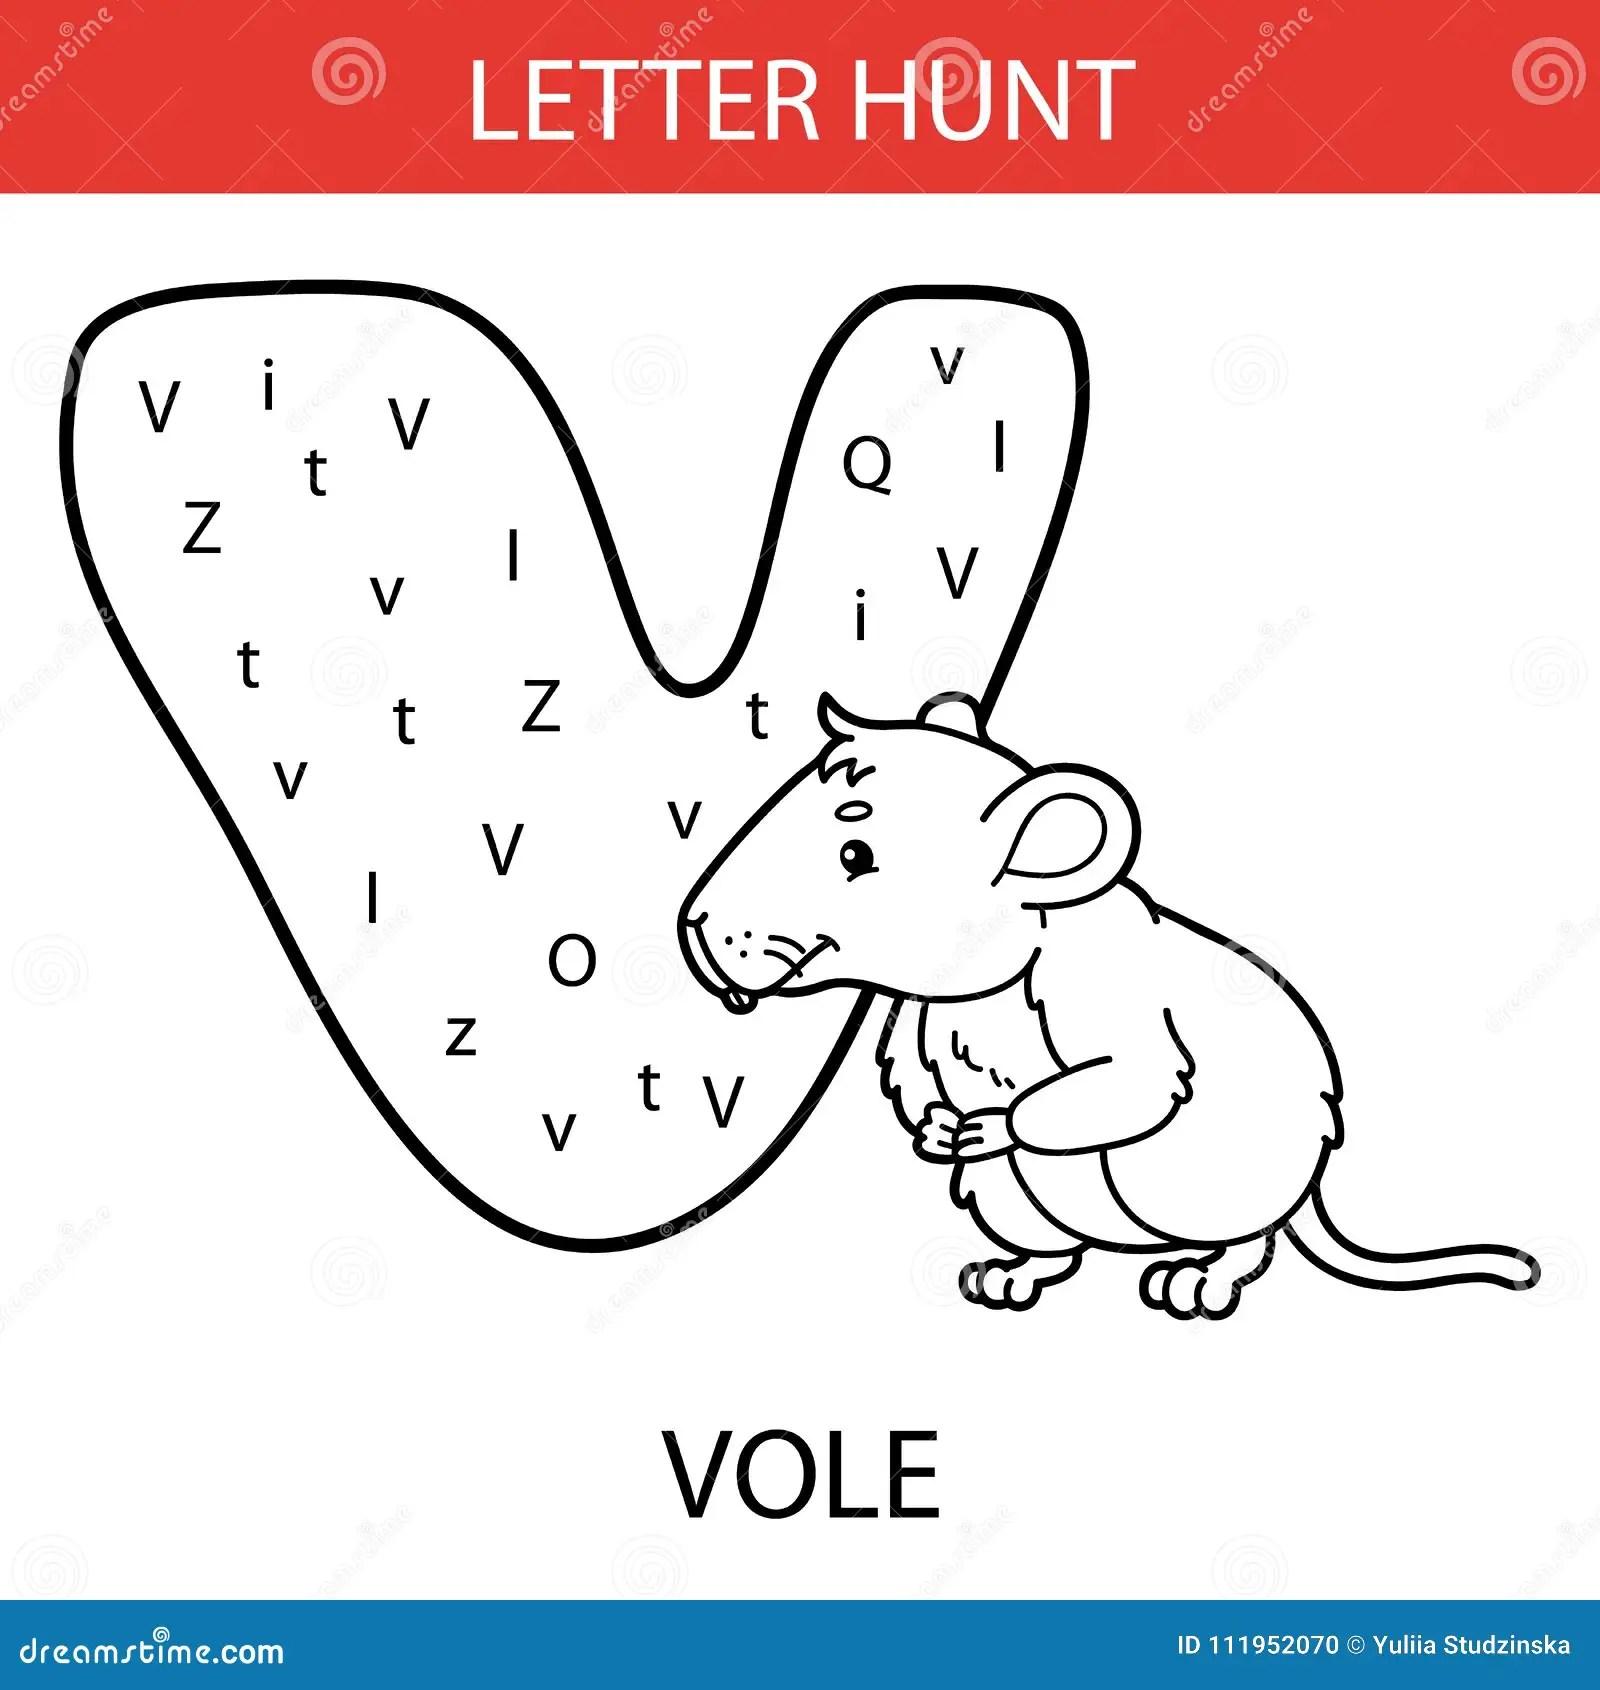 Animal Letter Hunt Vole Stock Vector Illustration Of